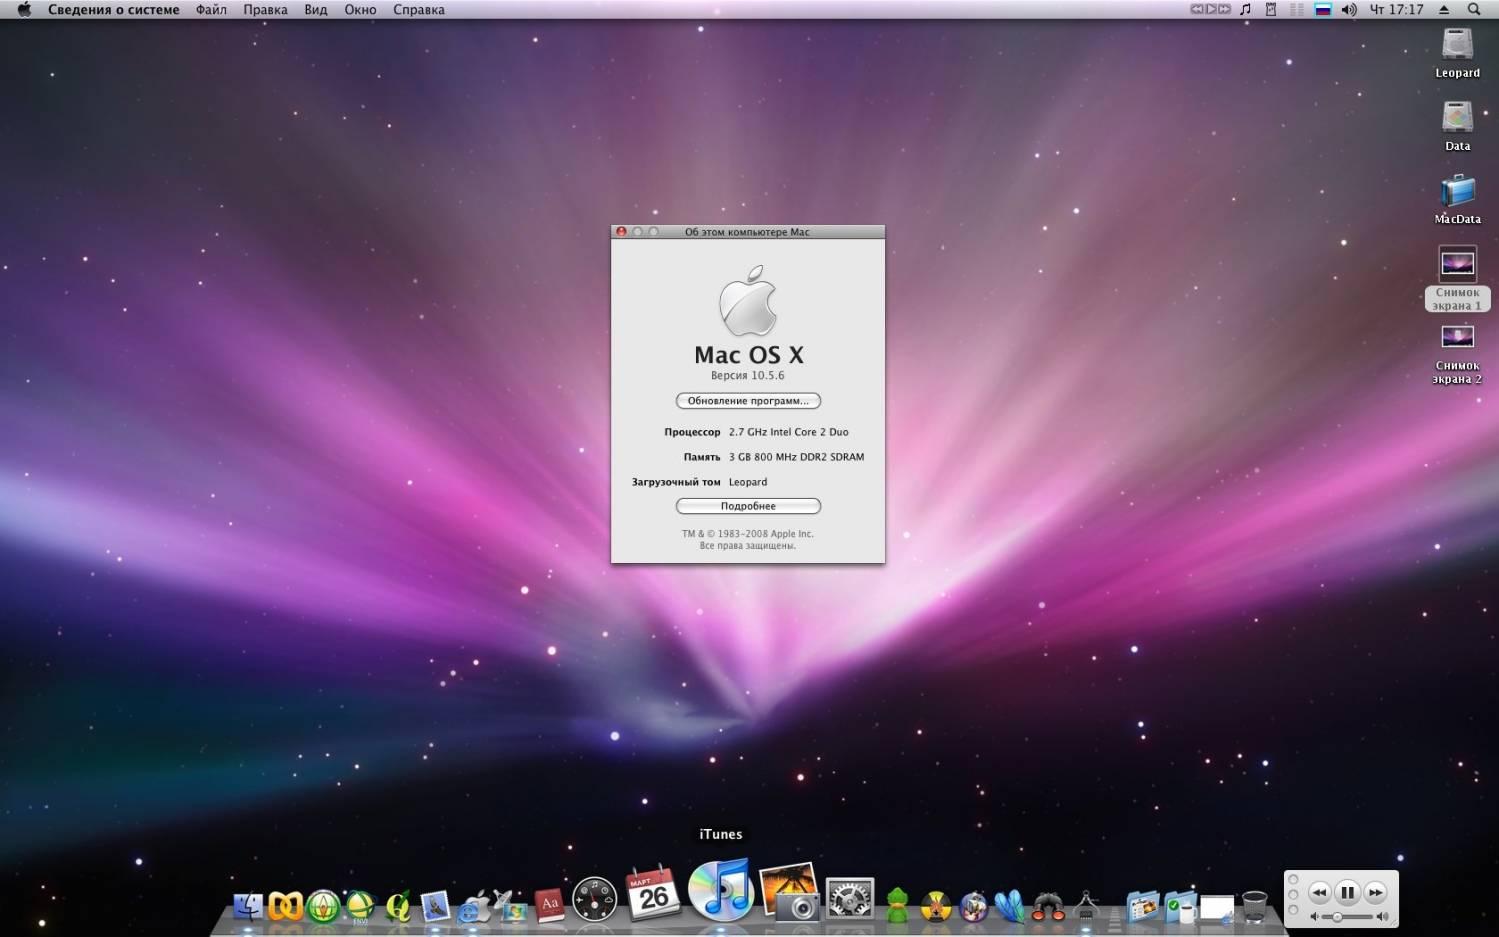 Mac os x snow leopard download apple